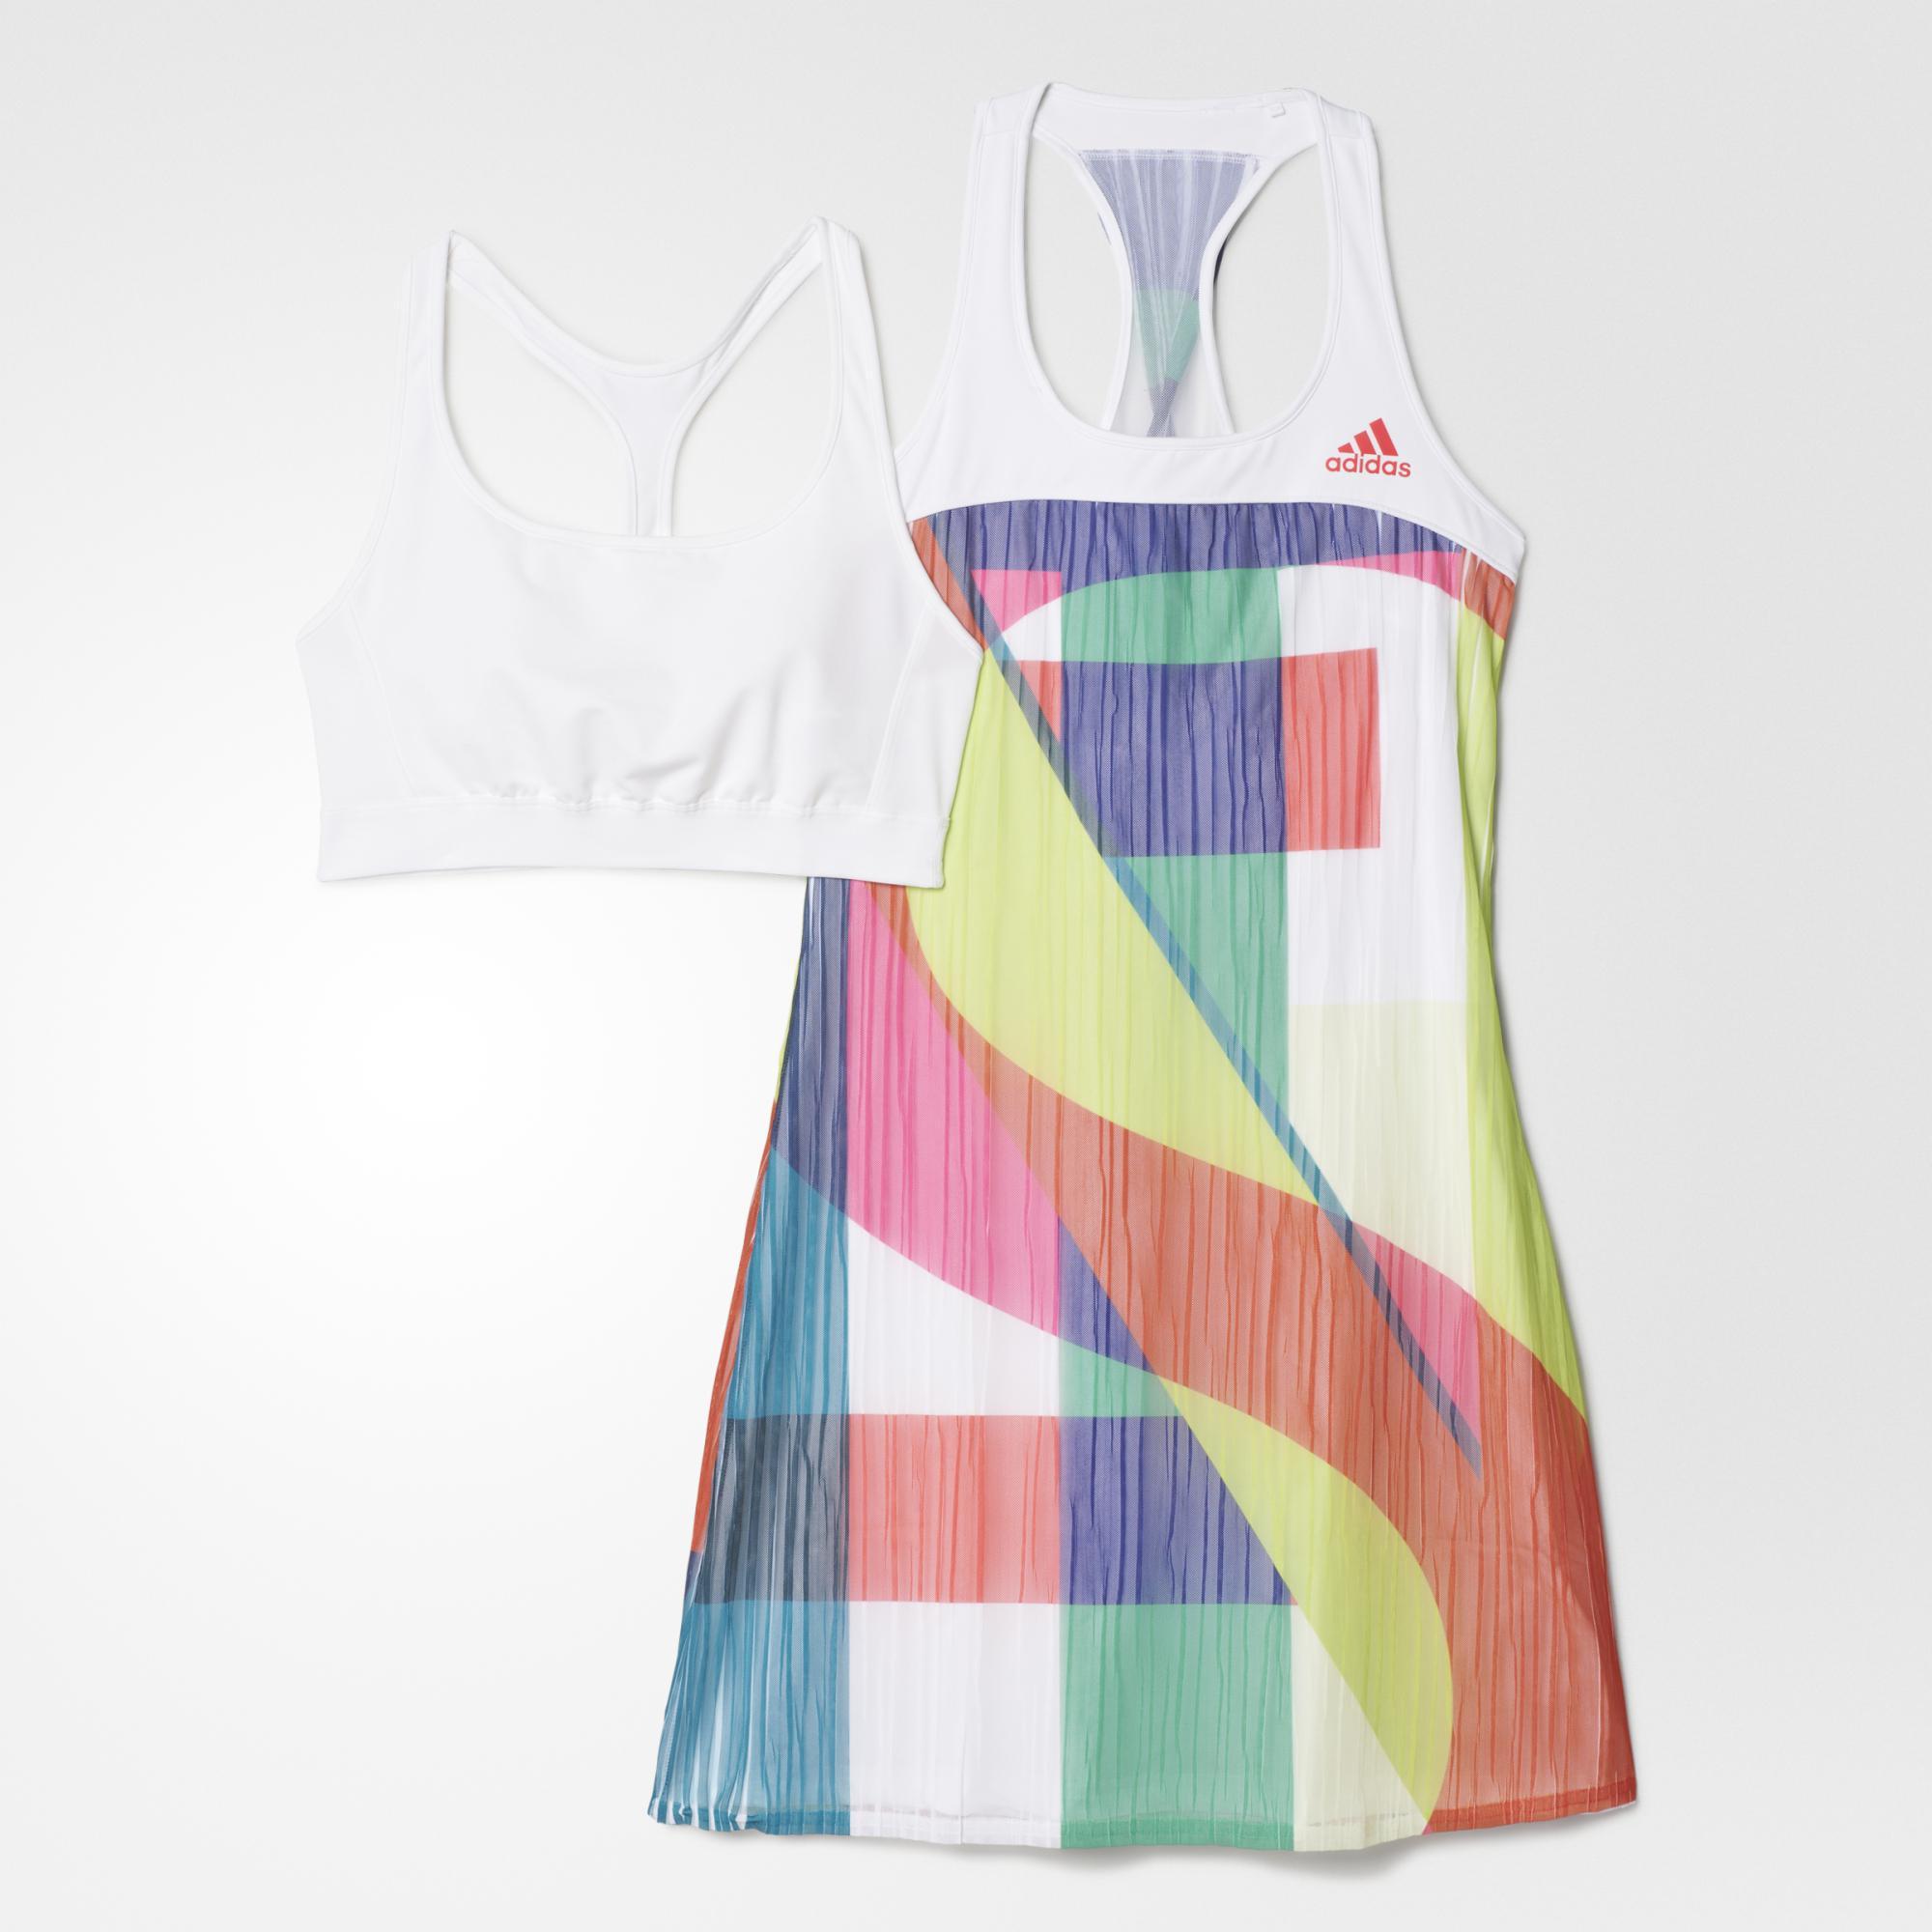 1106ec4a24a1 Adidas Womens Adizero Dress - White/Shock Red - Tennisnuts.com